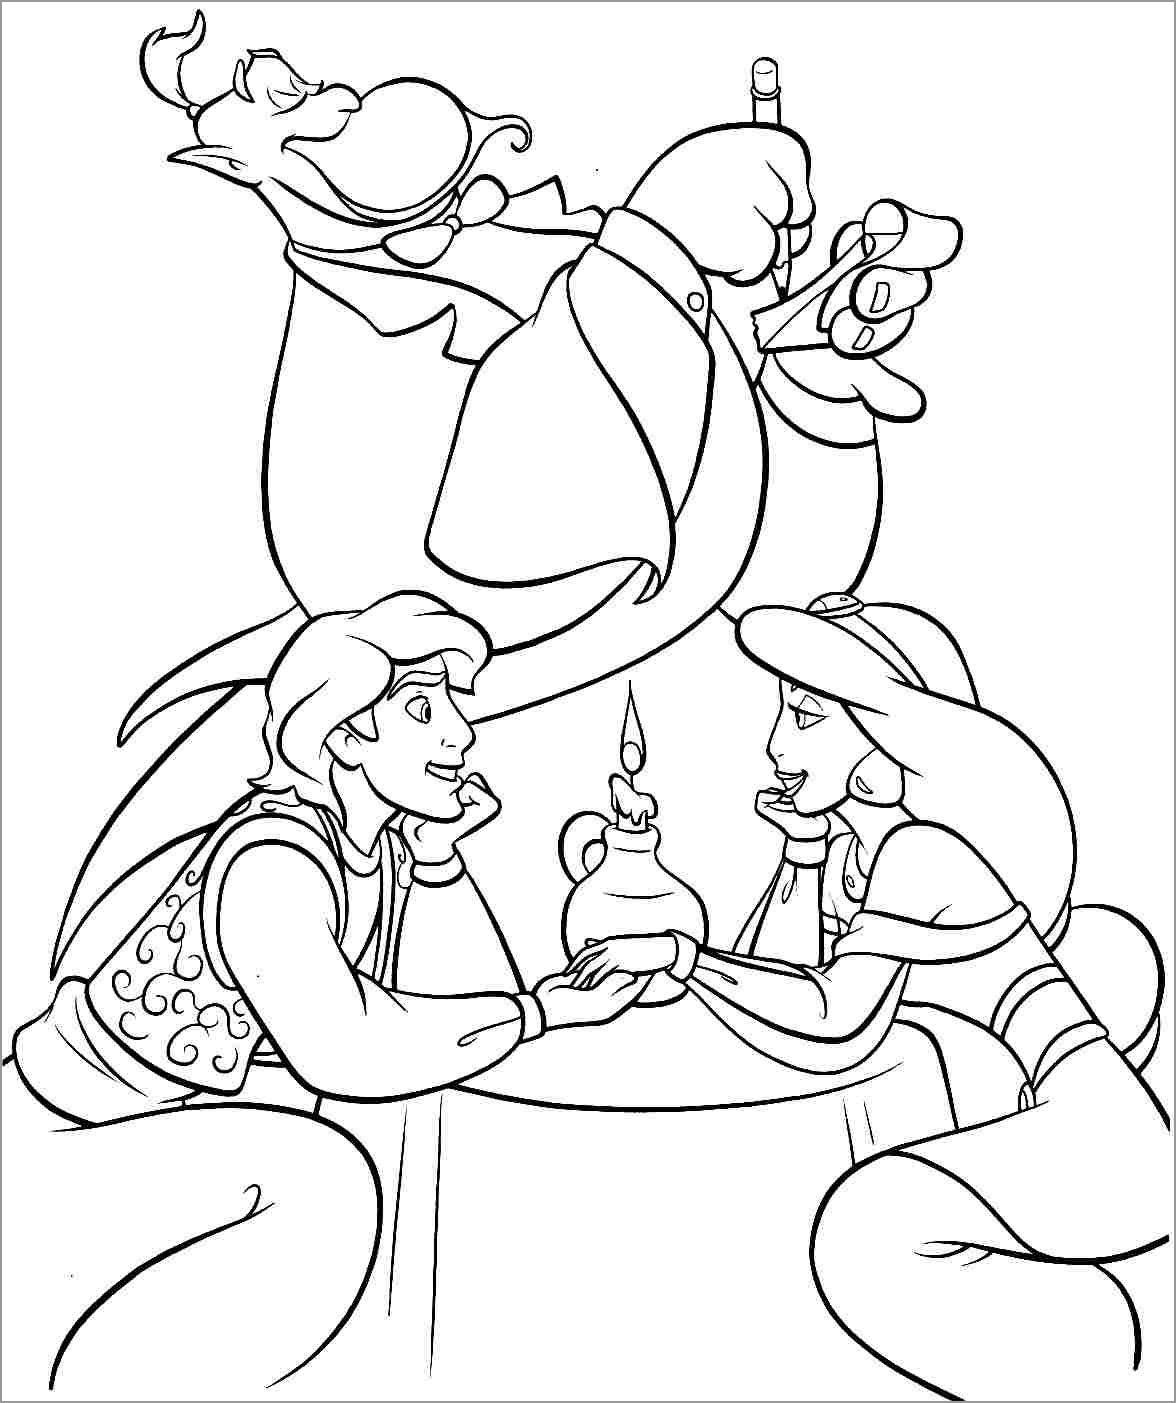 Aladdin, Jasmine and Genie Coloring Page